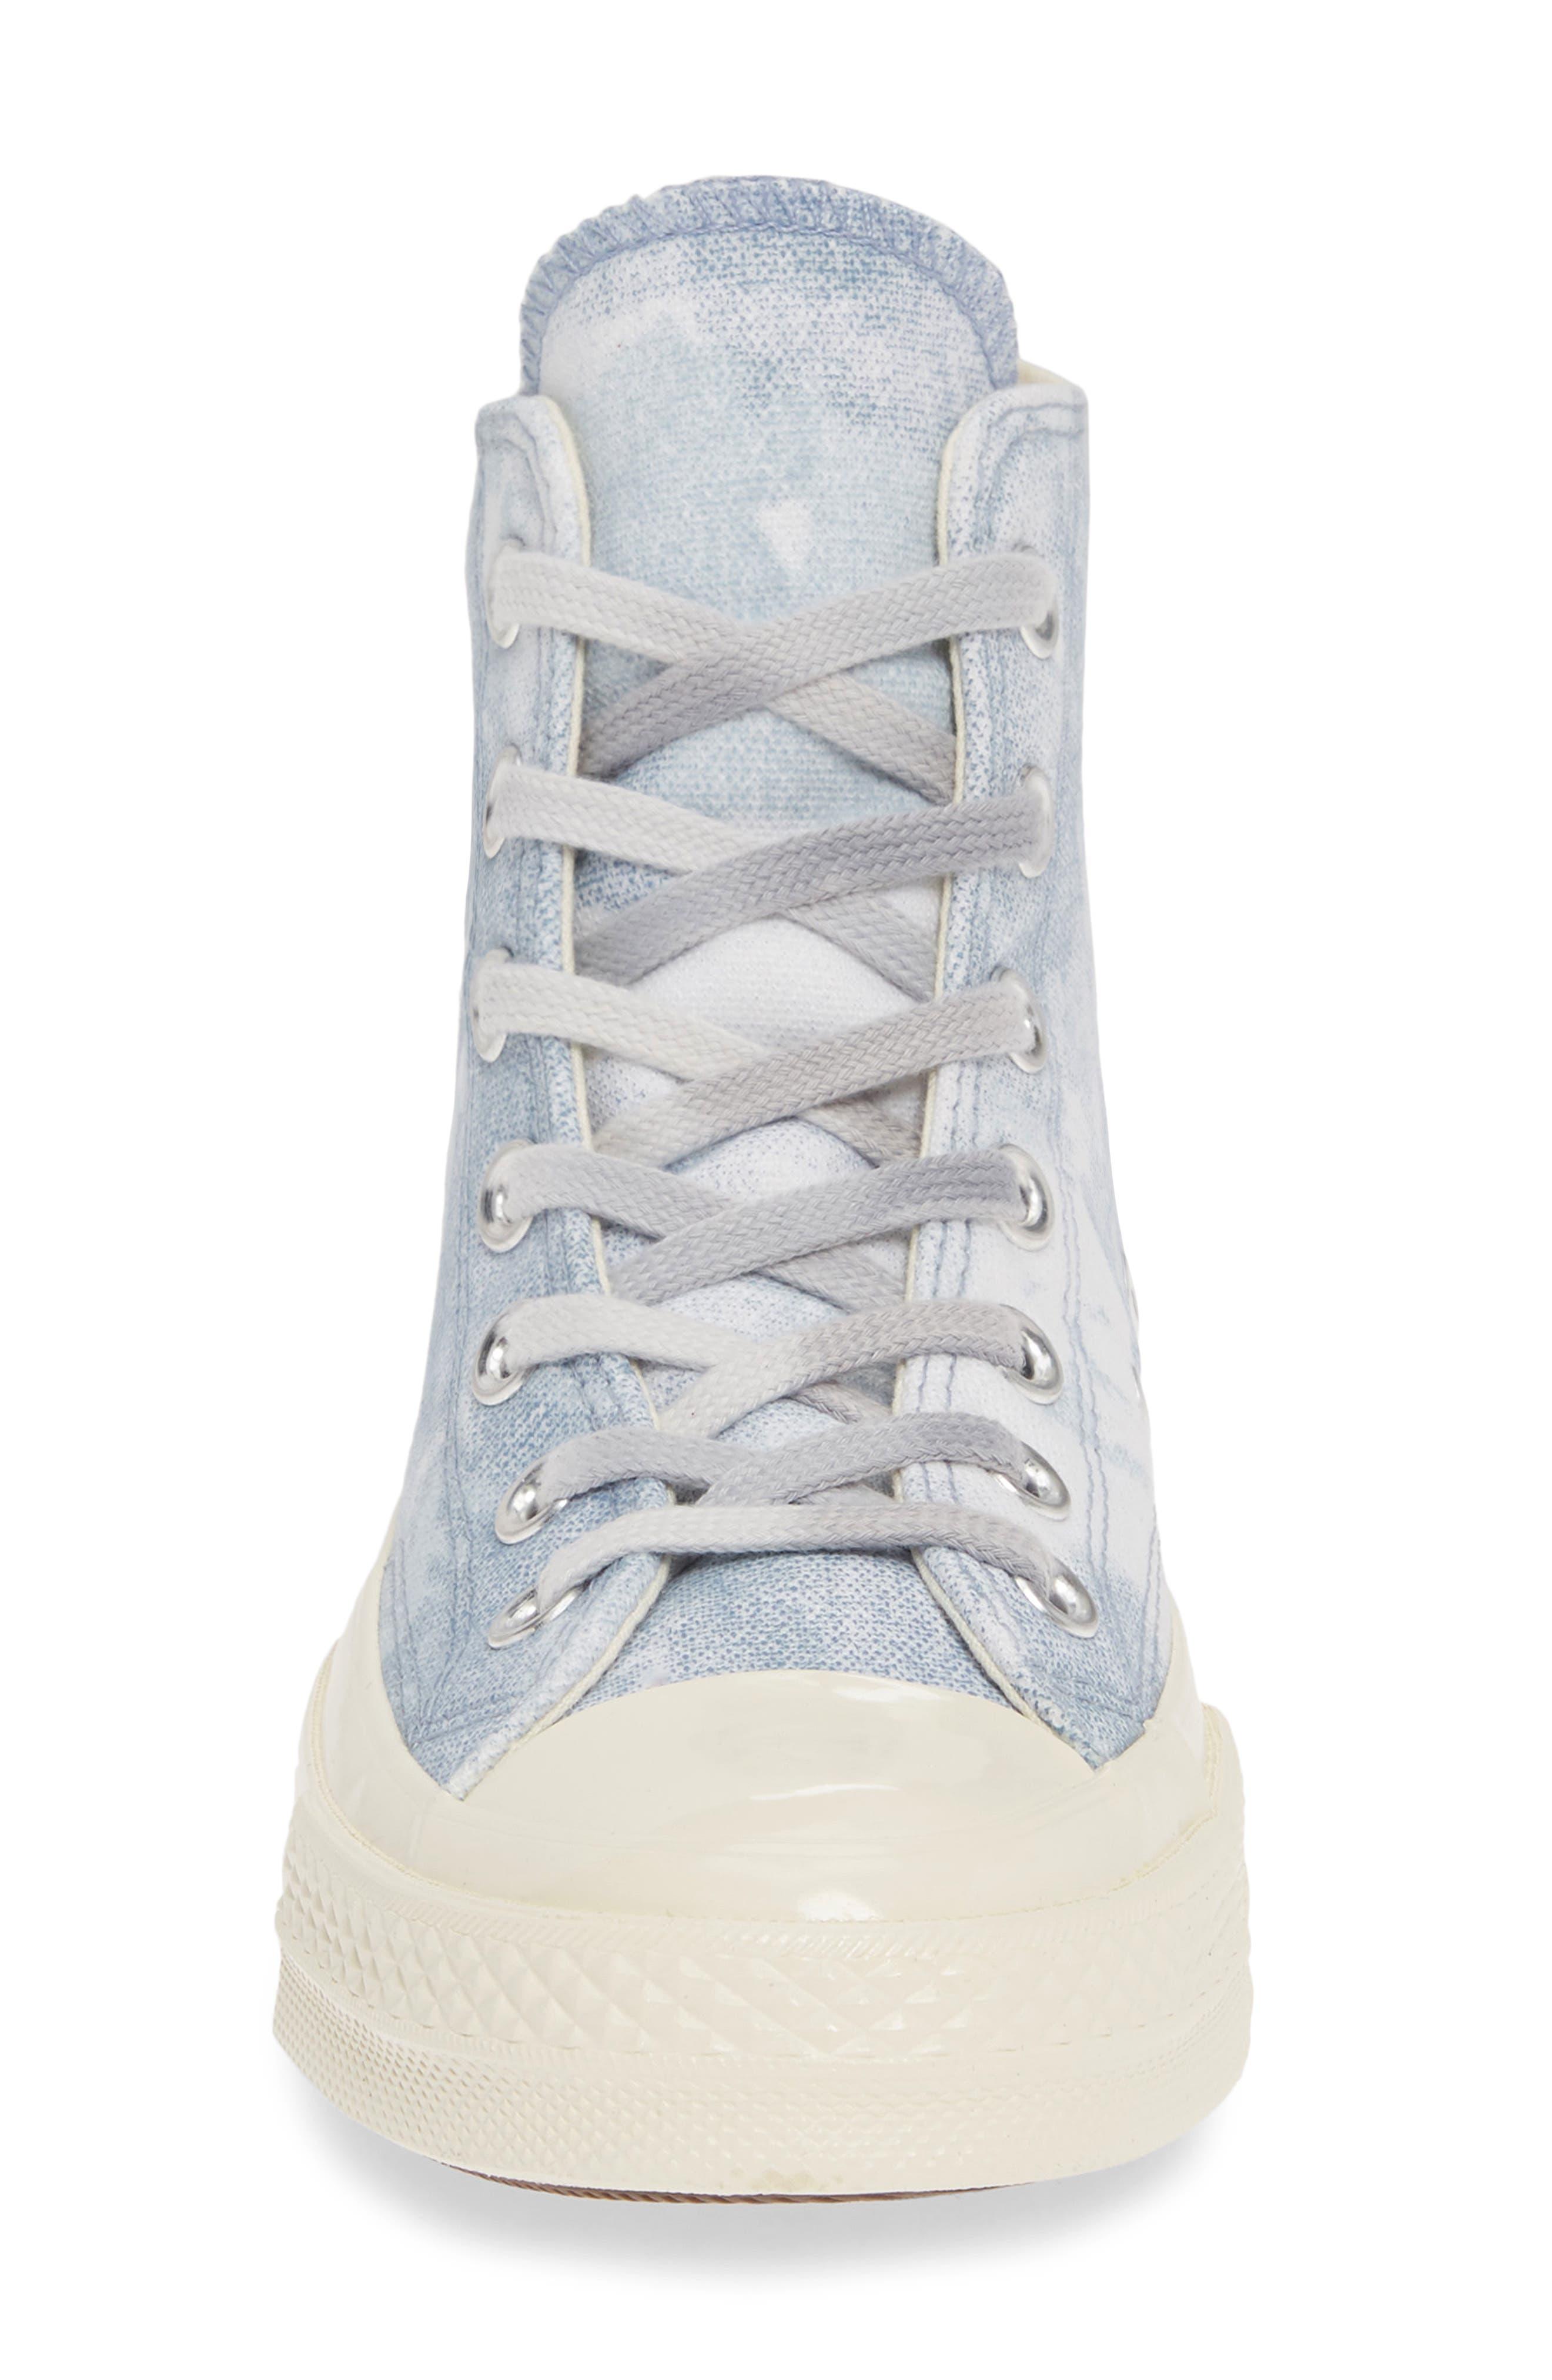 CONVERSE, Chuck Taylor<sup>®</sup> All Star<sup>®</sup> 70 High Top Sneaker, Alternate thumbnail 4, color, INDIGO FOG/ PLATINUM/ EGRET